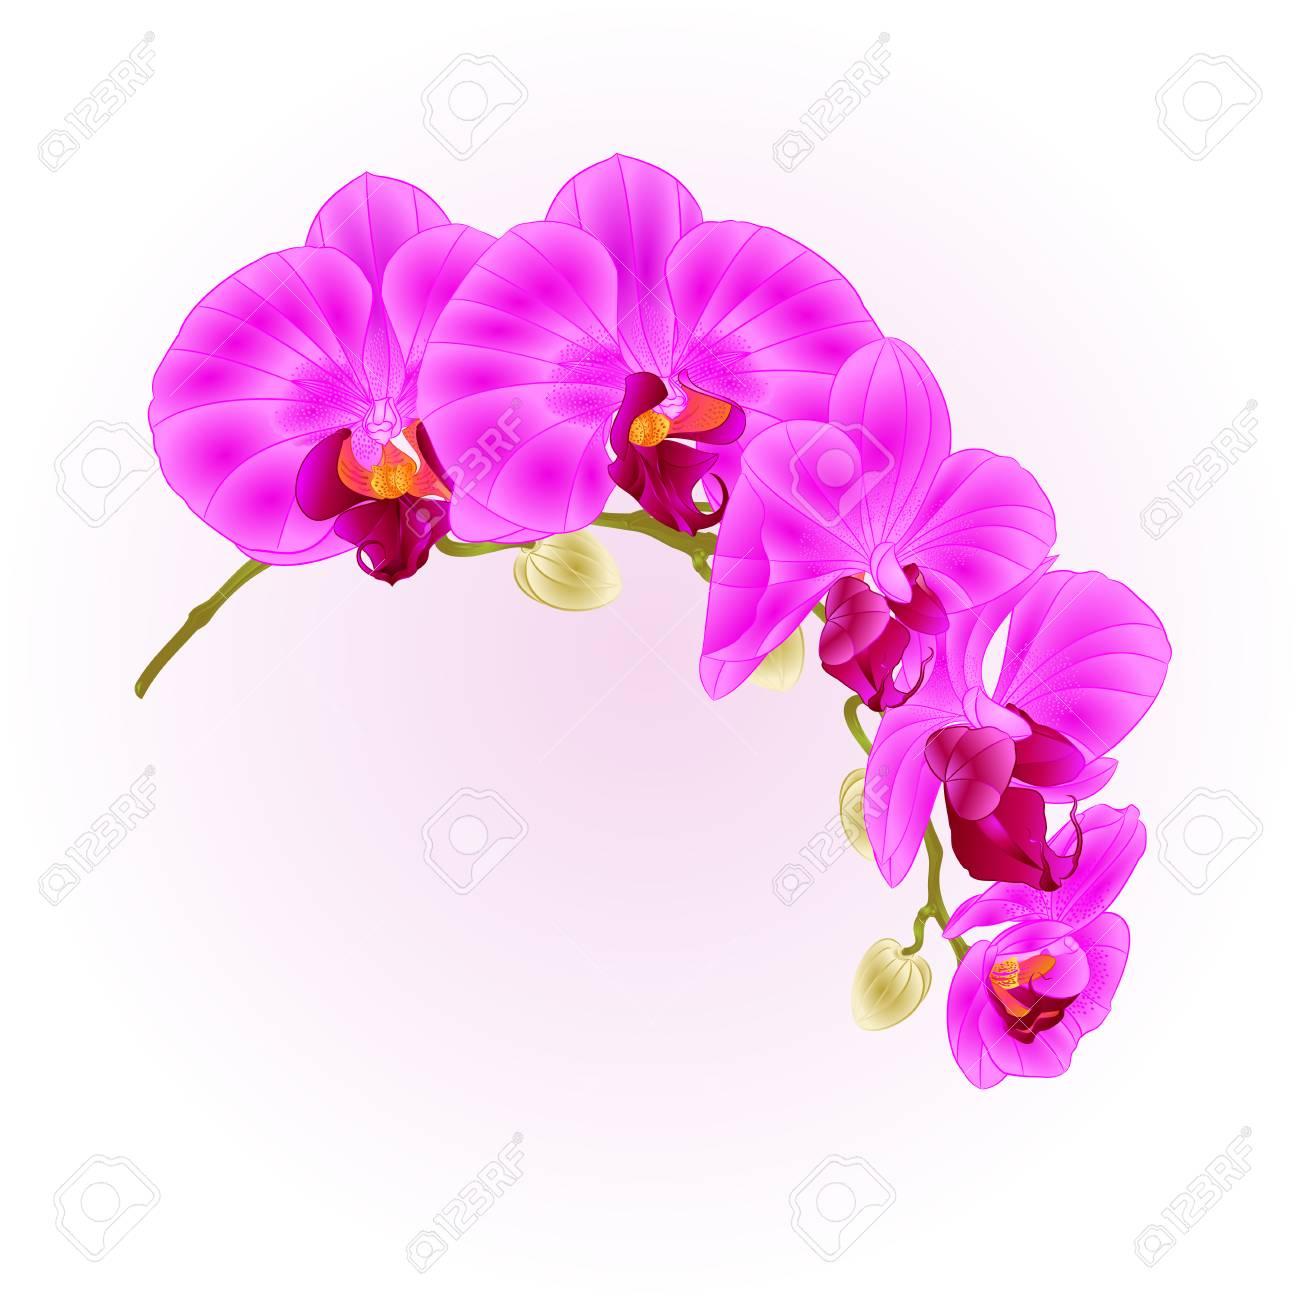 Beautiful phalaenopsis orchid purple stem with flowers and buds beautiful phalaenopsis orchid purple stem with flowers and buds closeup vintage isolated vector editable illustration hand mightylinksfo